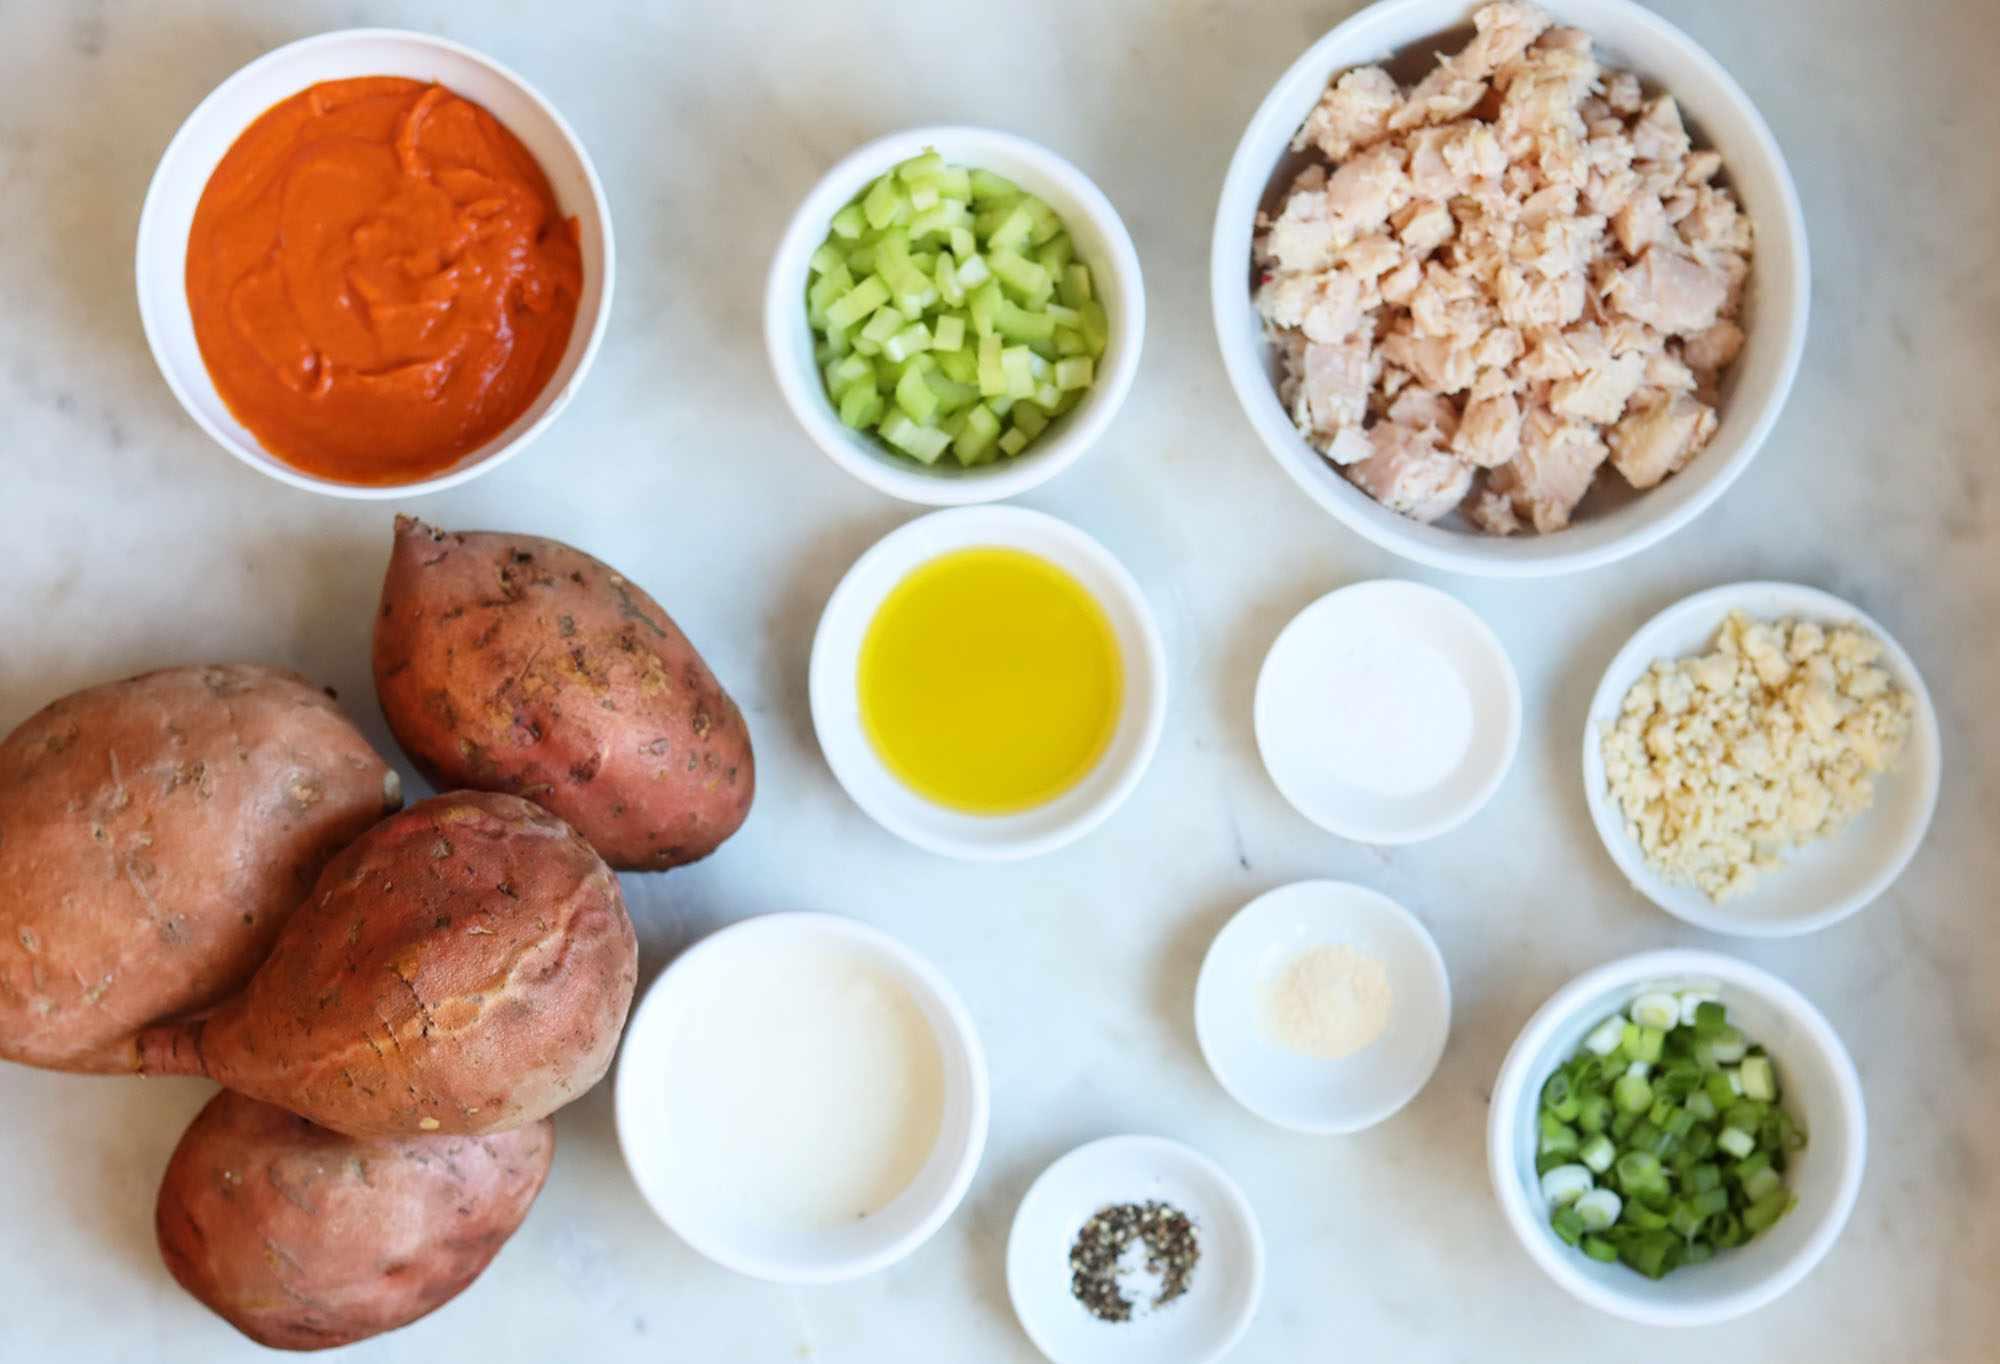 ingredients for chicken stuffed sweet potatoes